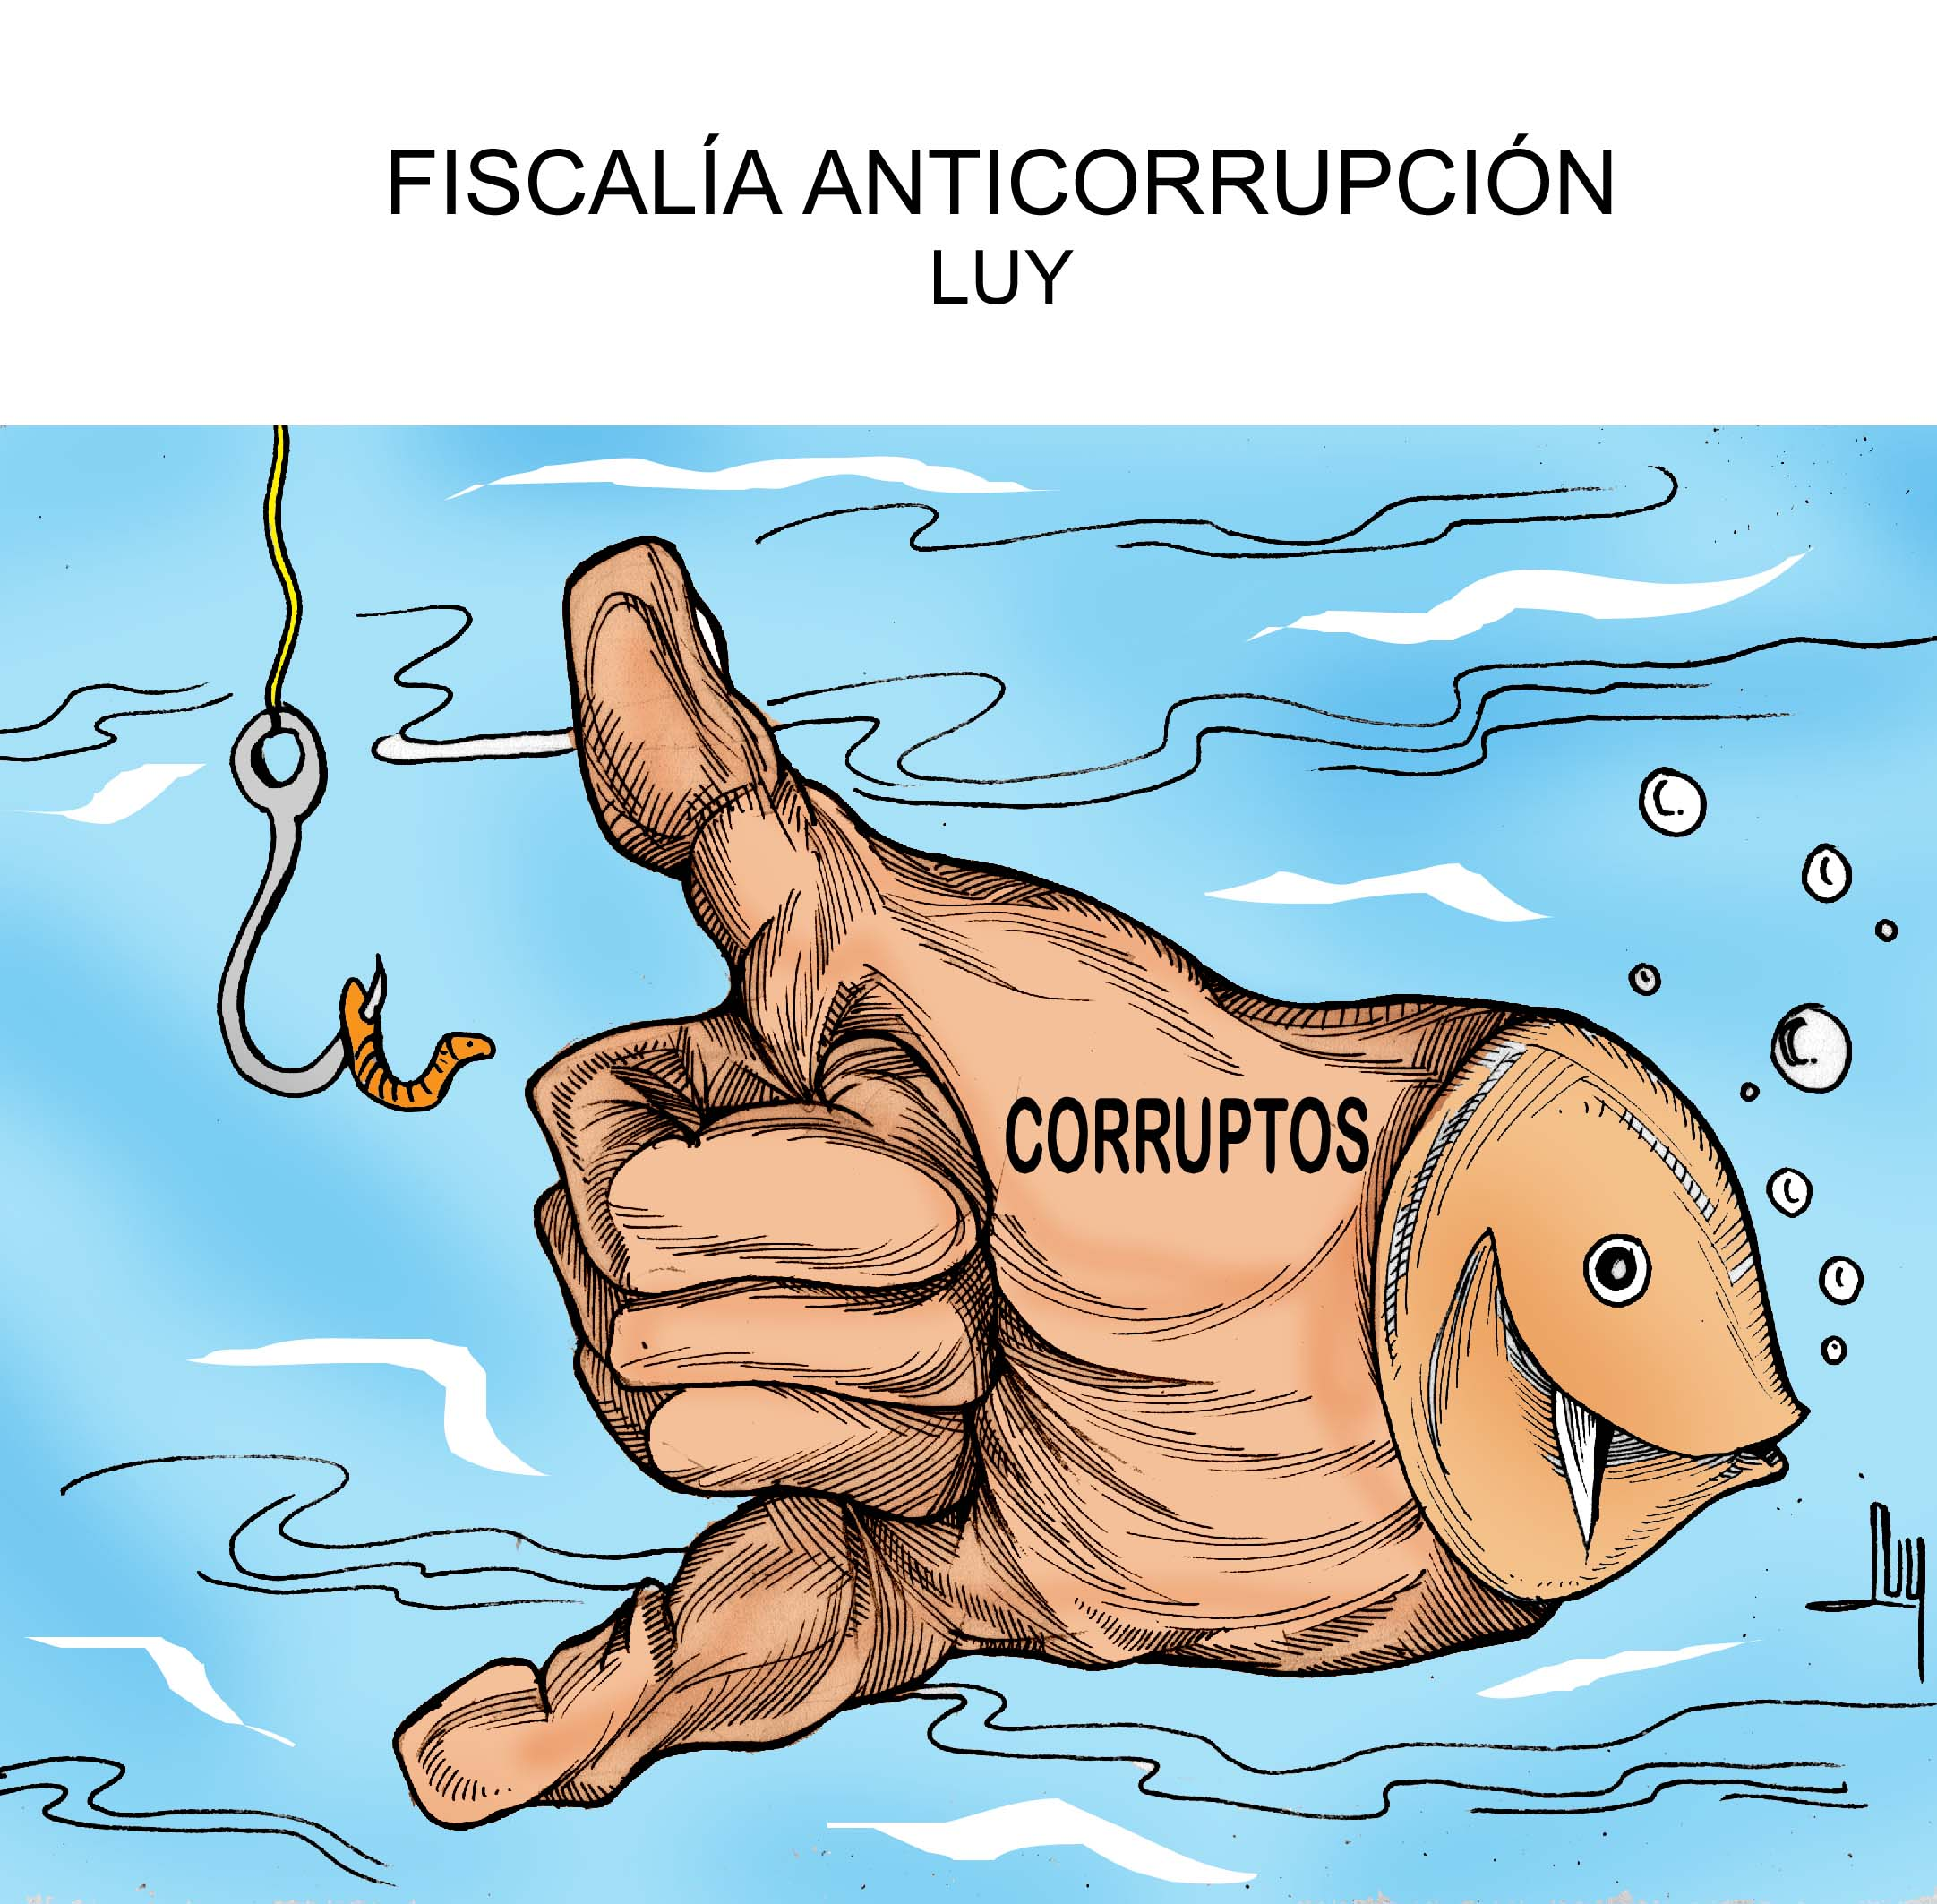 fiscalia-anticorrupcion